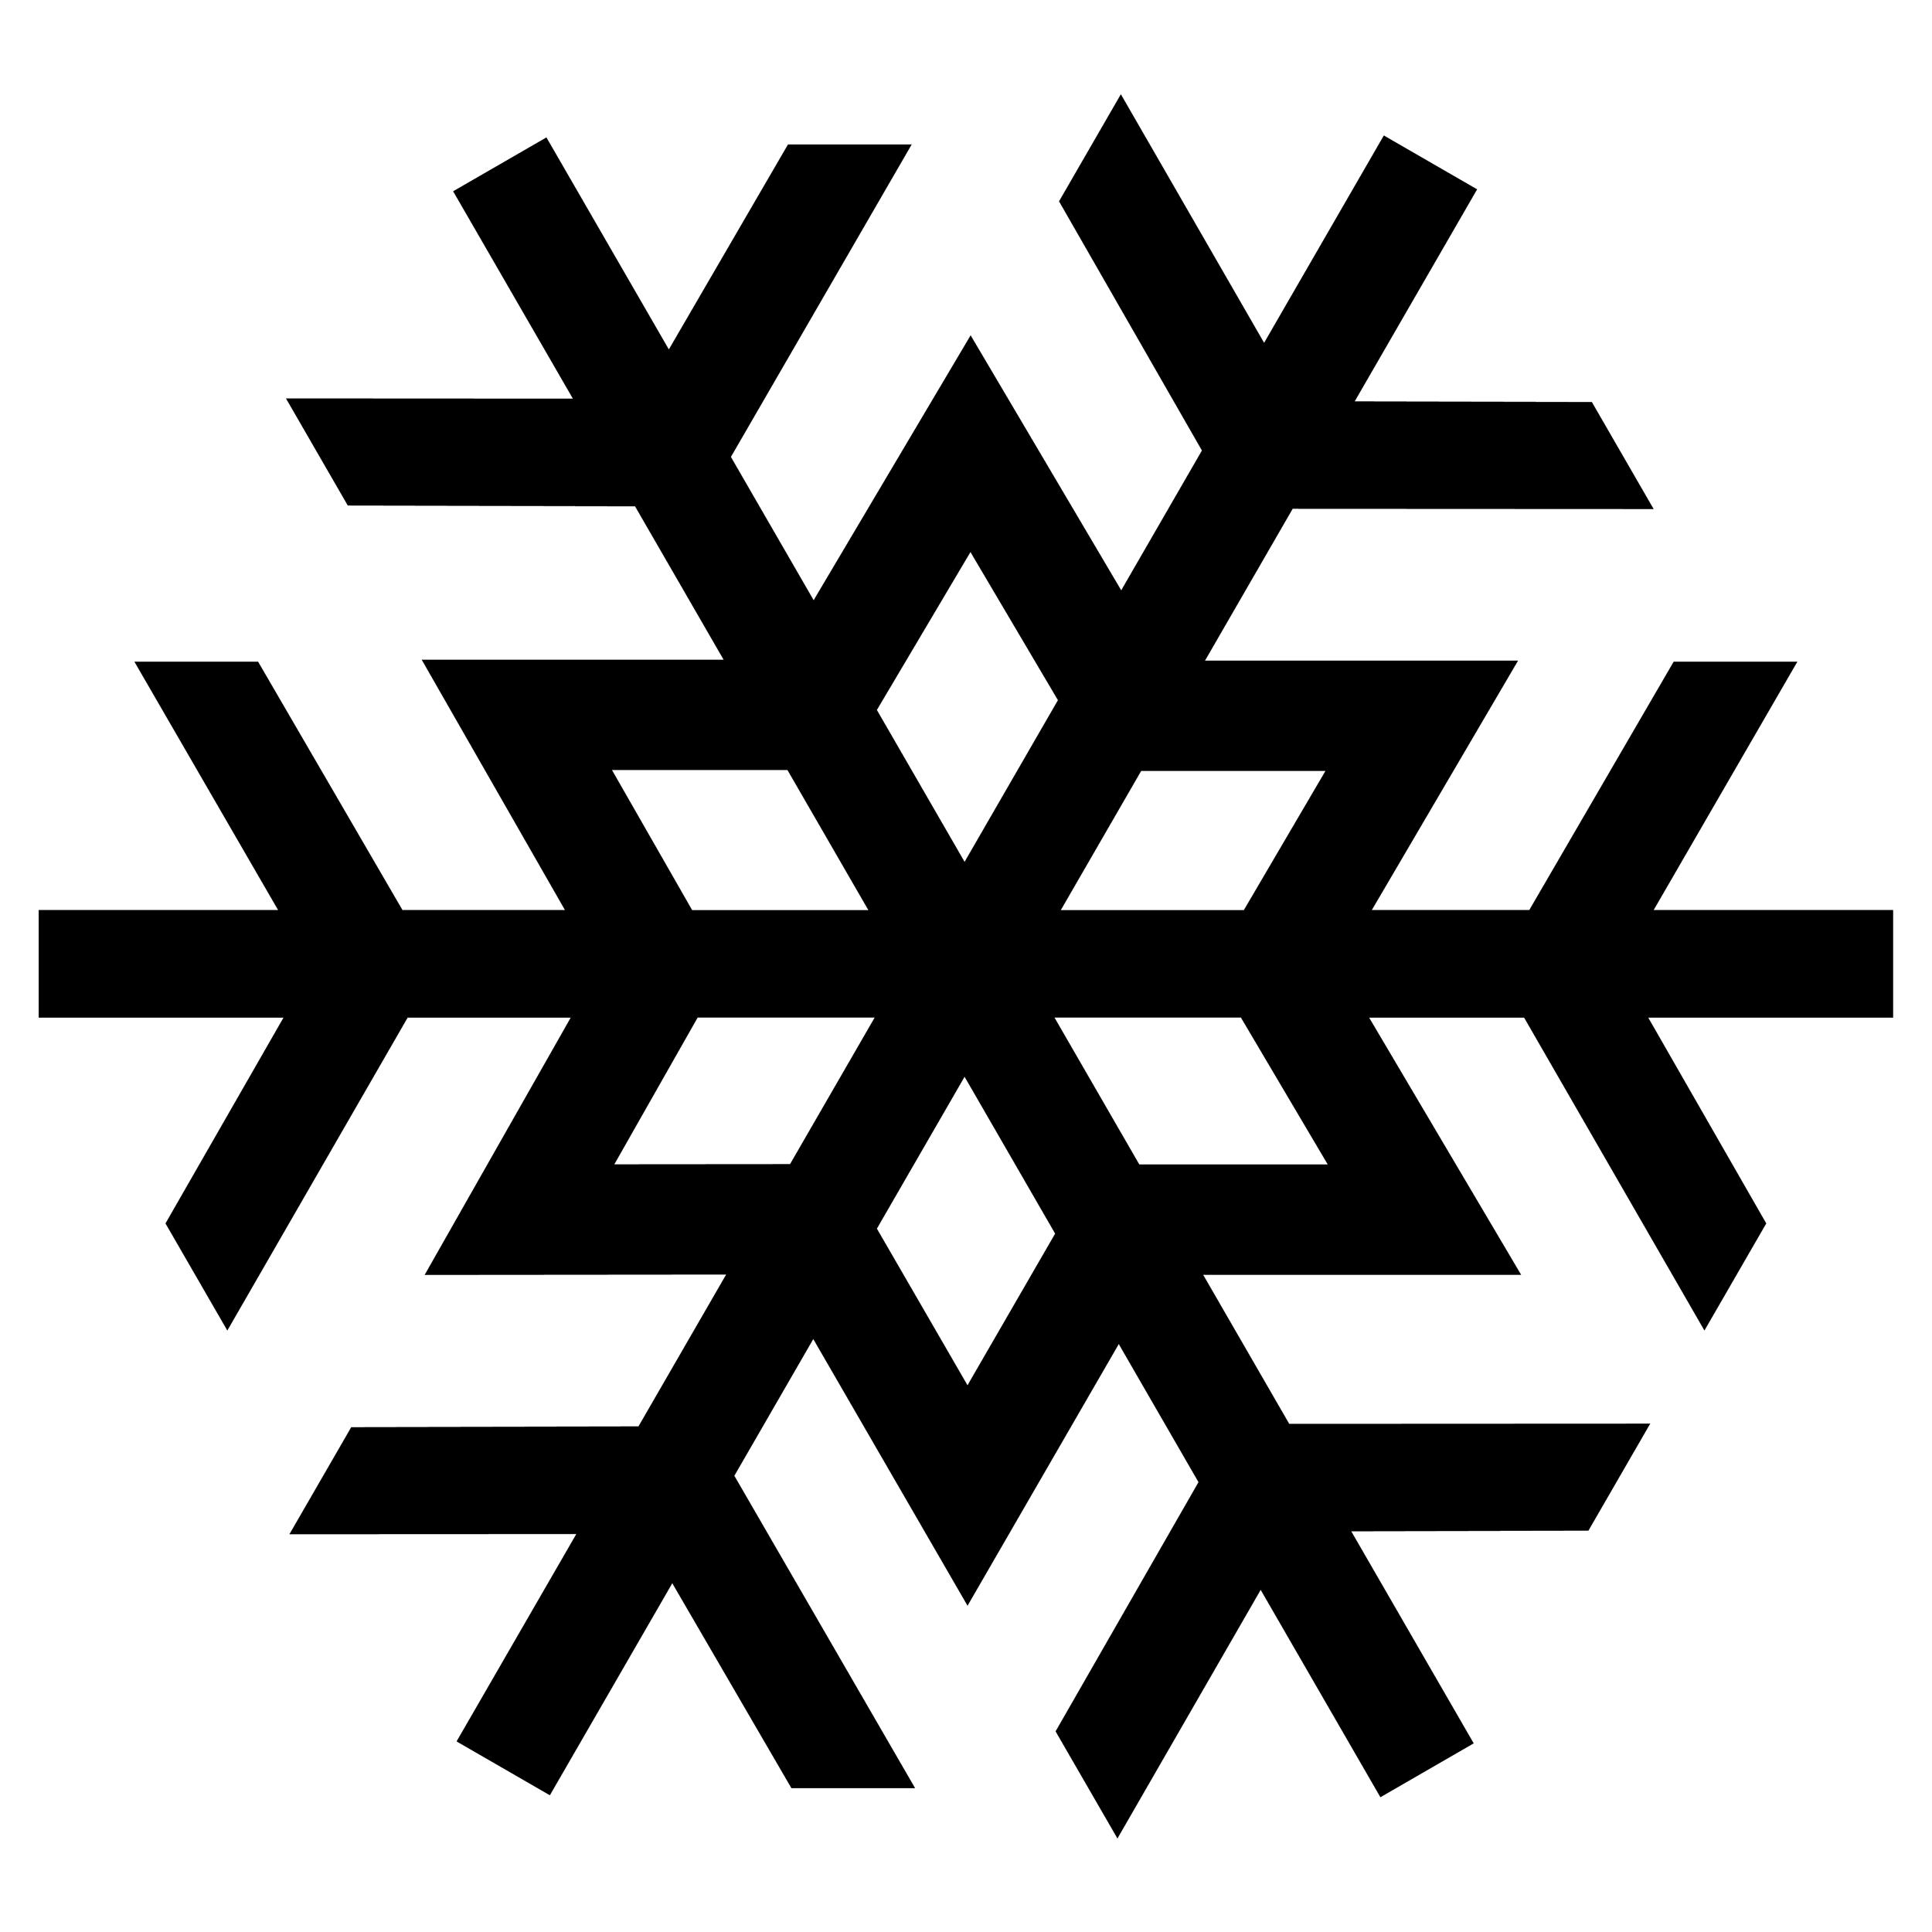 Snow clipart simple snowflake Snow silhouette snowflake silhouette Google